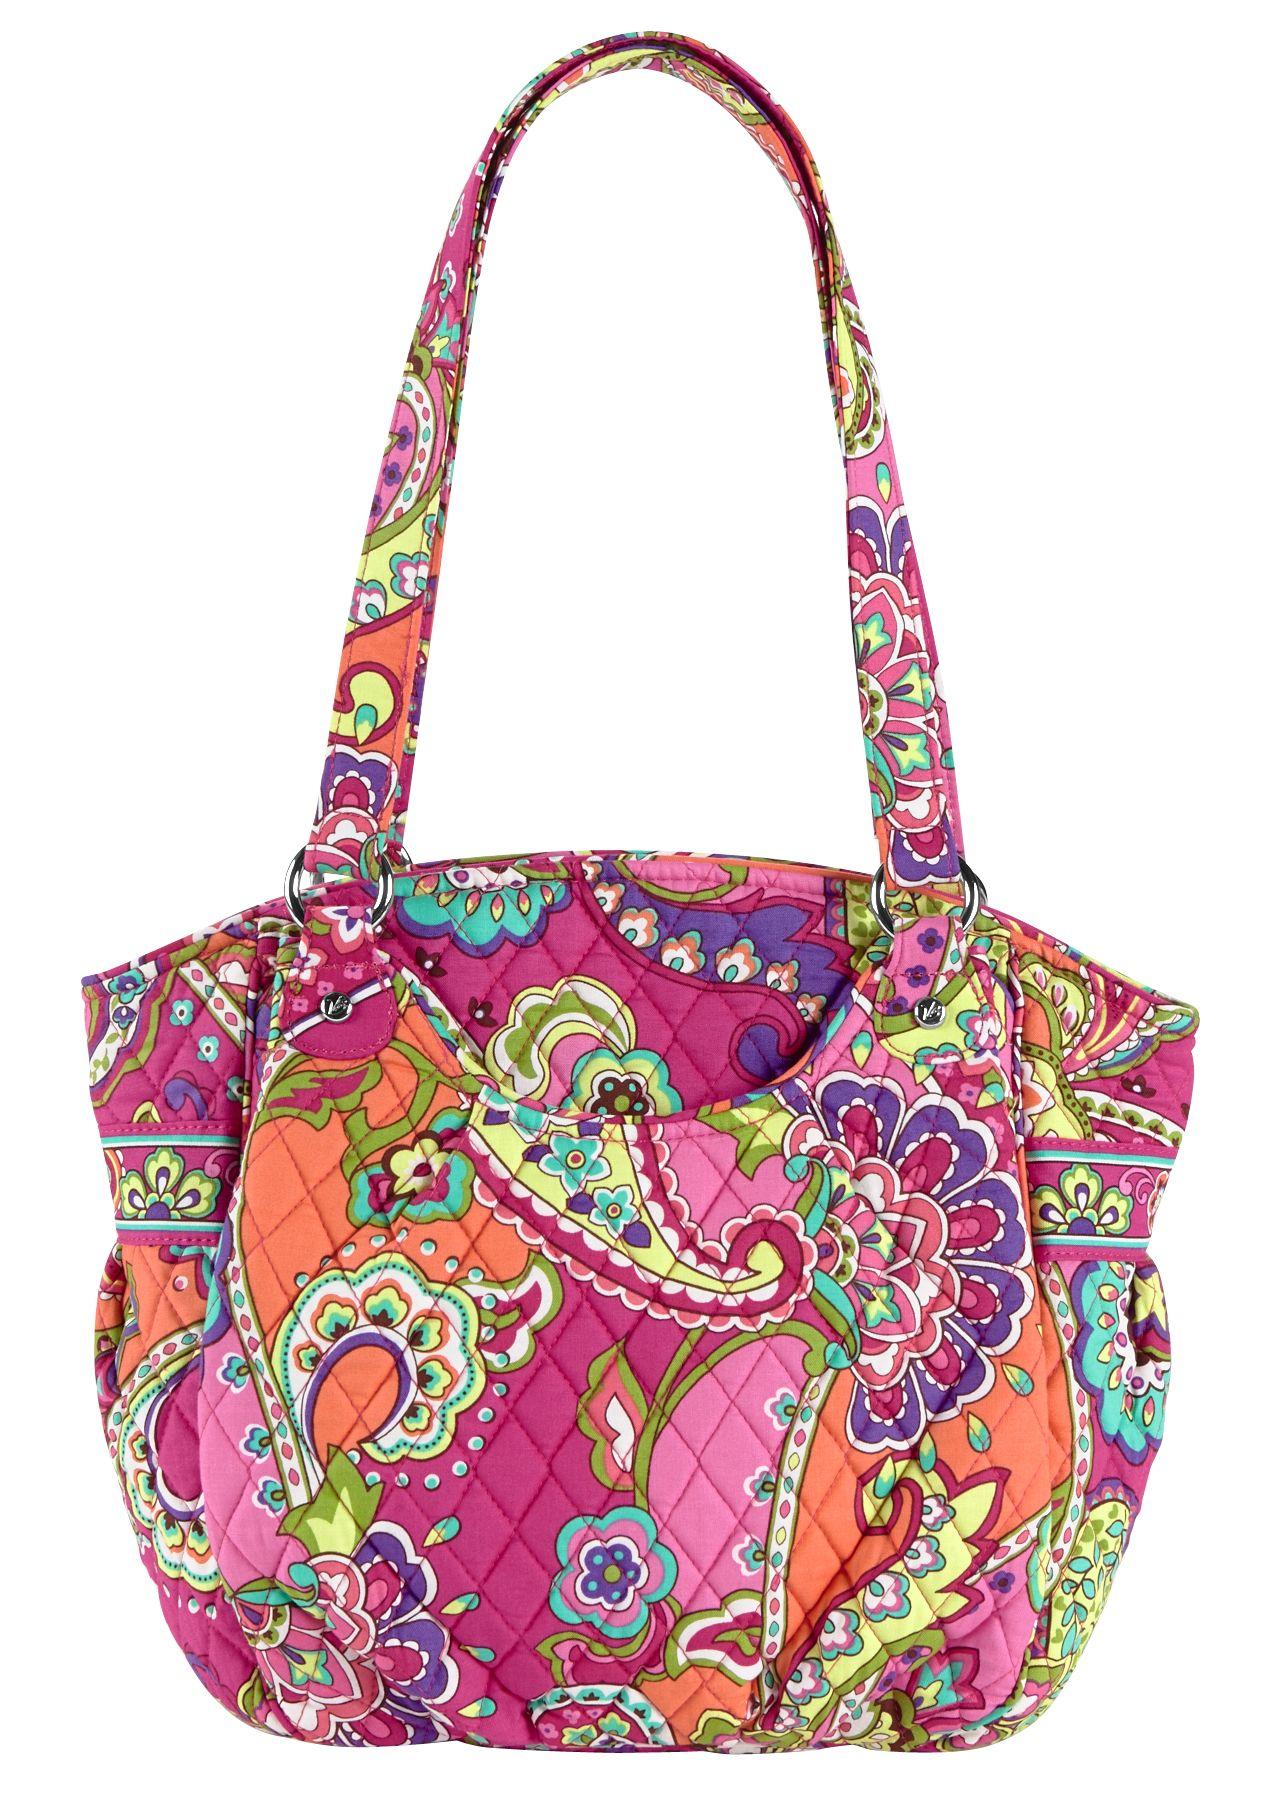 Vera Bradley Glenna Shoulder Bag in Pink Swirls